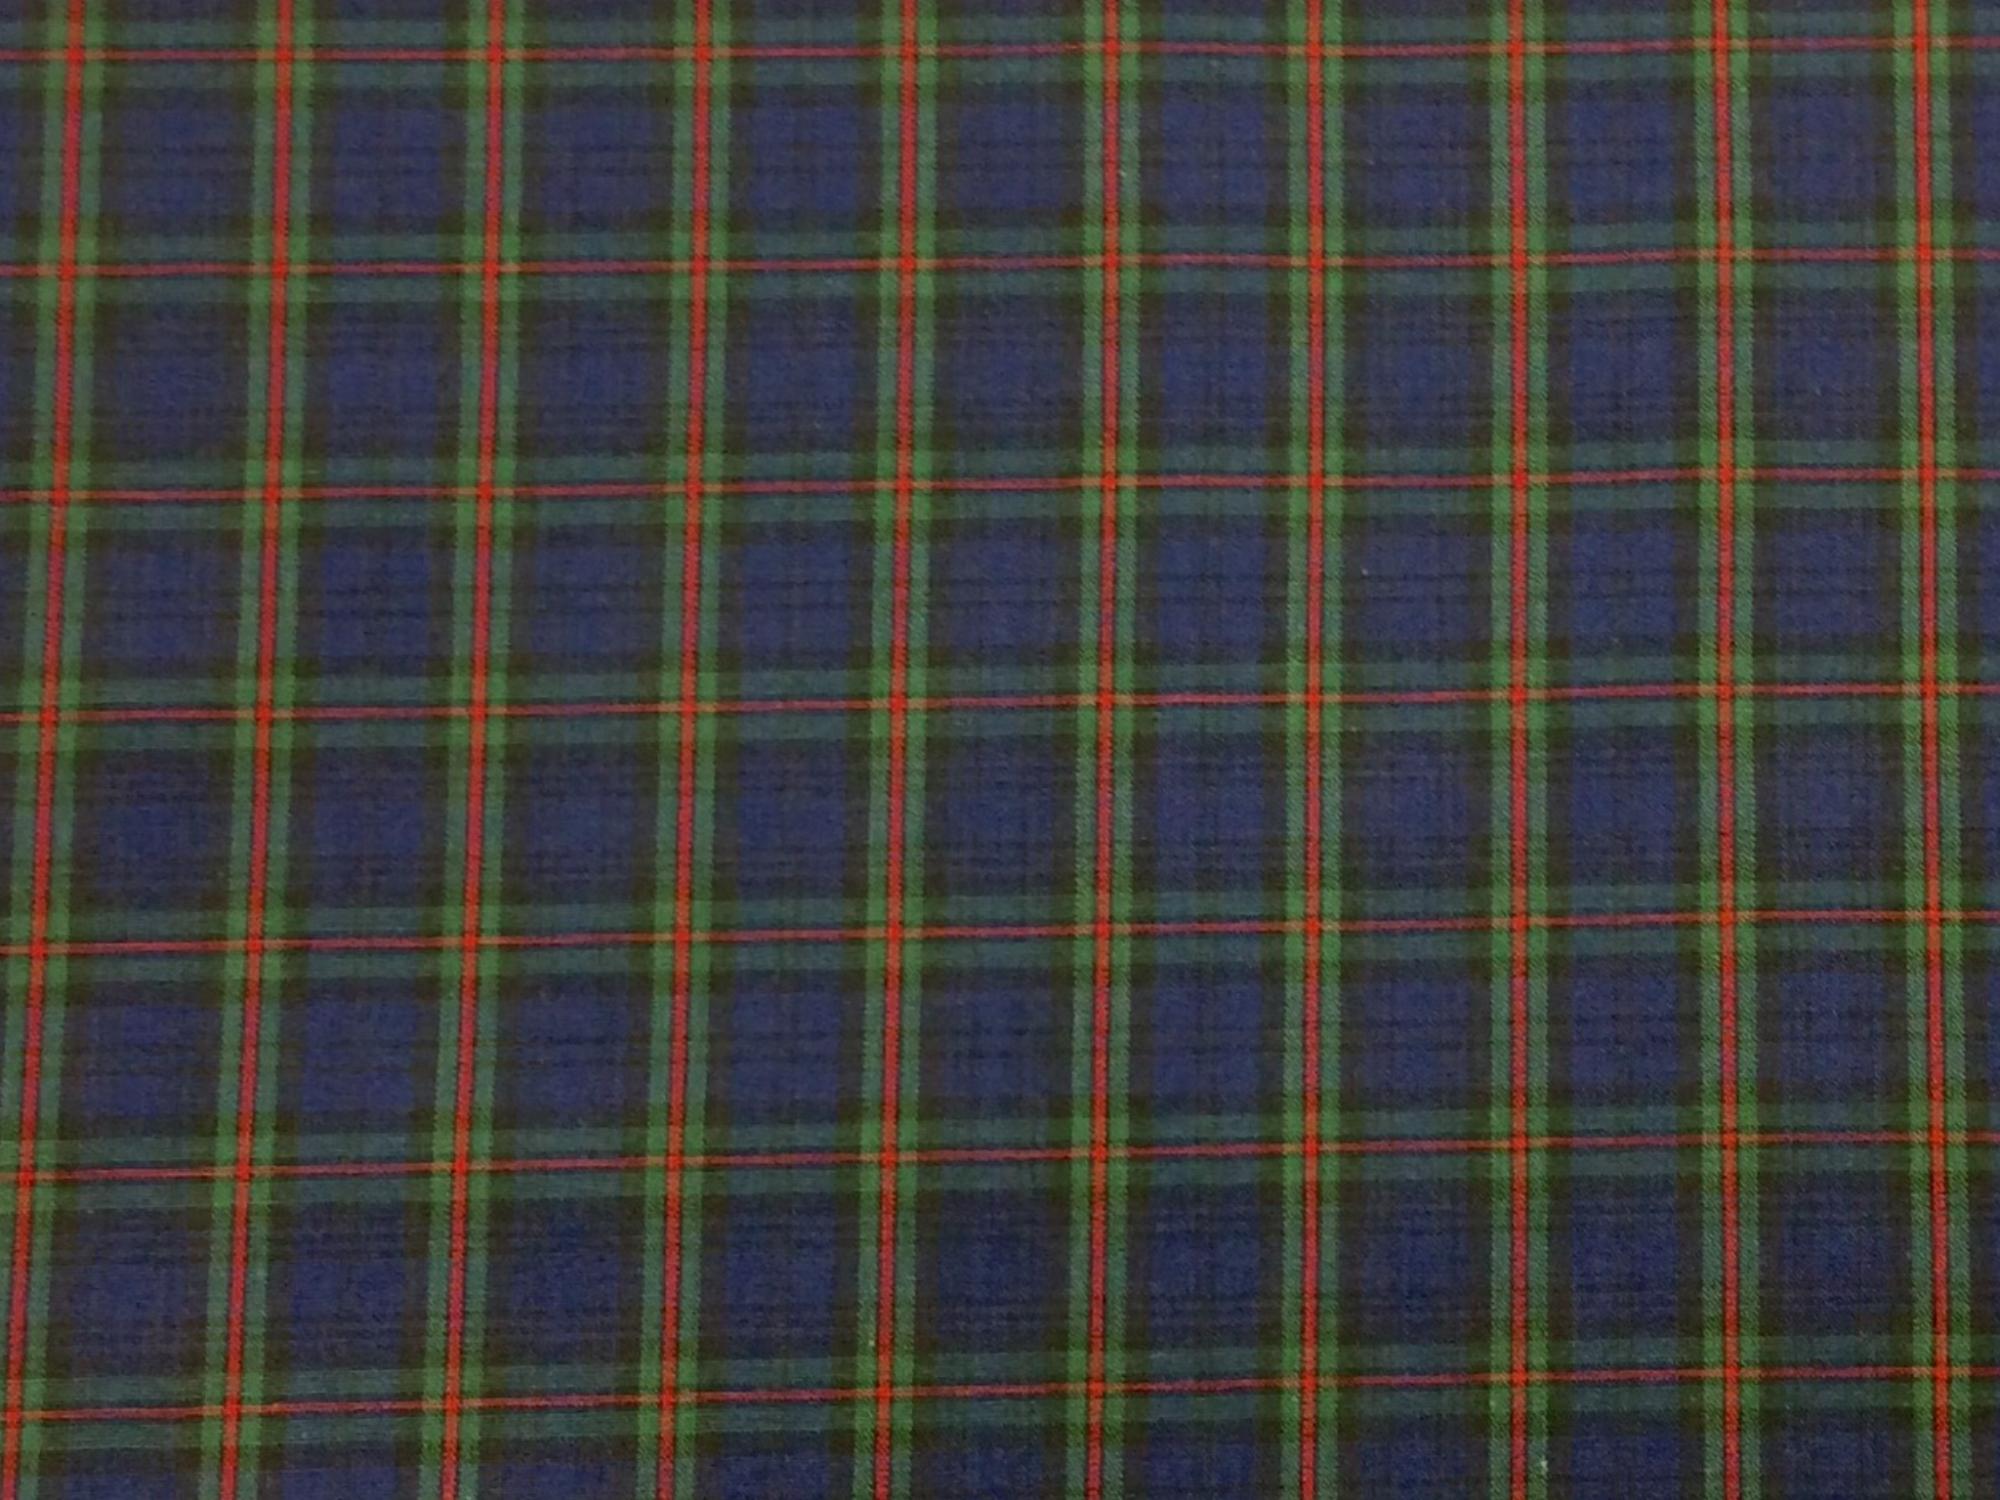 Tartan Plaid Campbell Clan Apparel Fabric Yarn Dyed Fabric FTP13